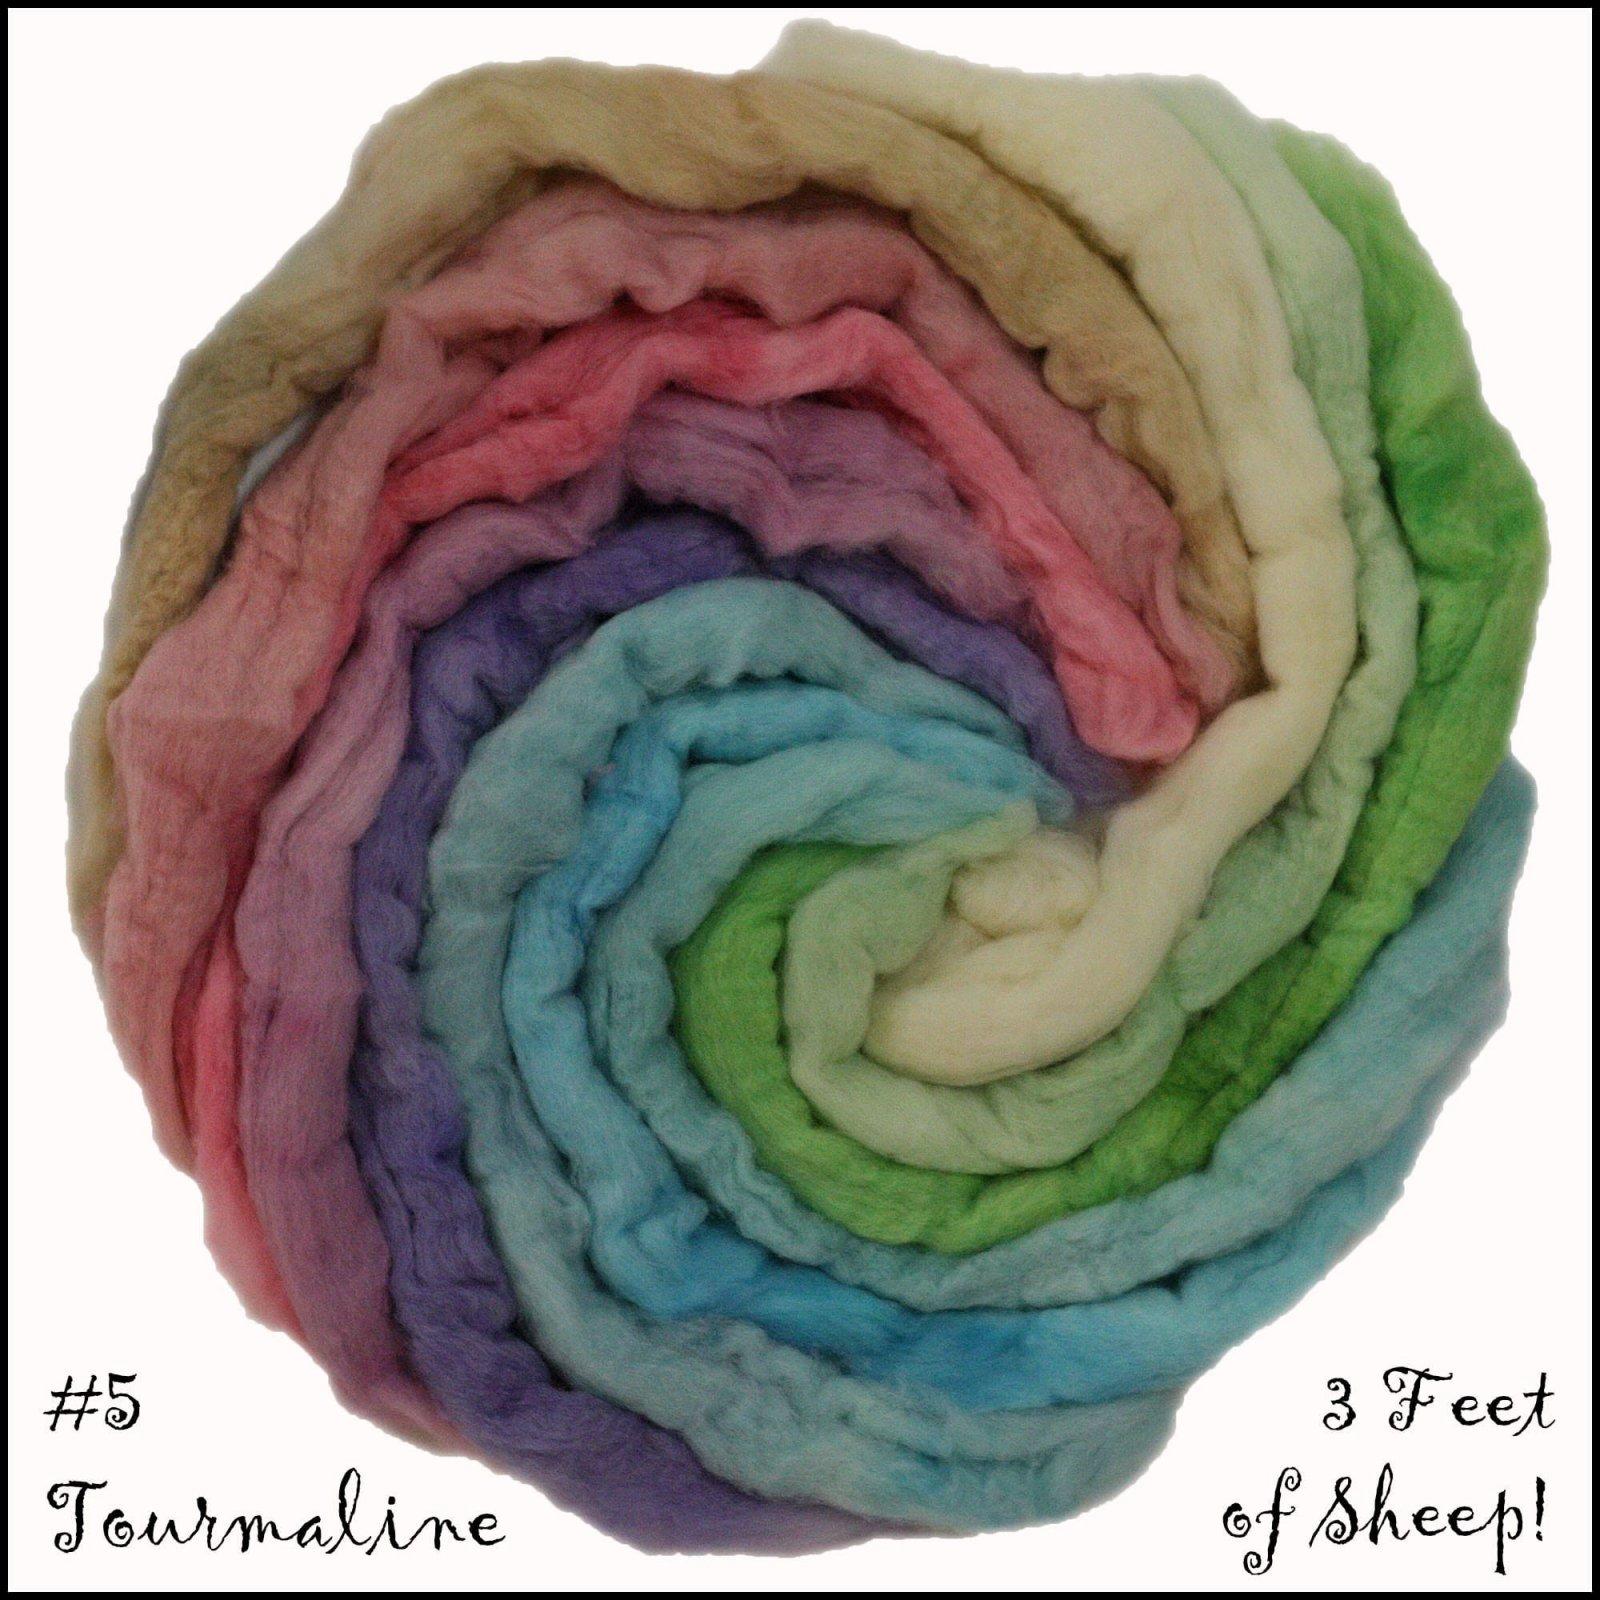 Three Feet of Sheep-#5 Tourmaline